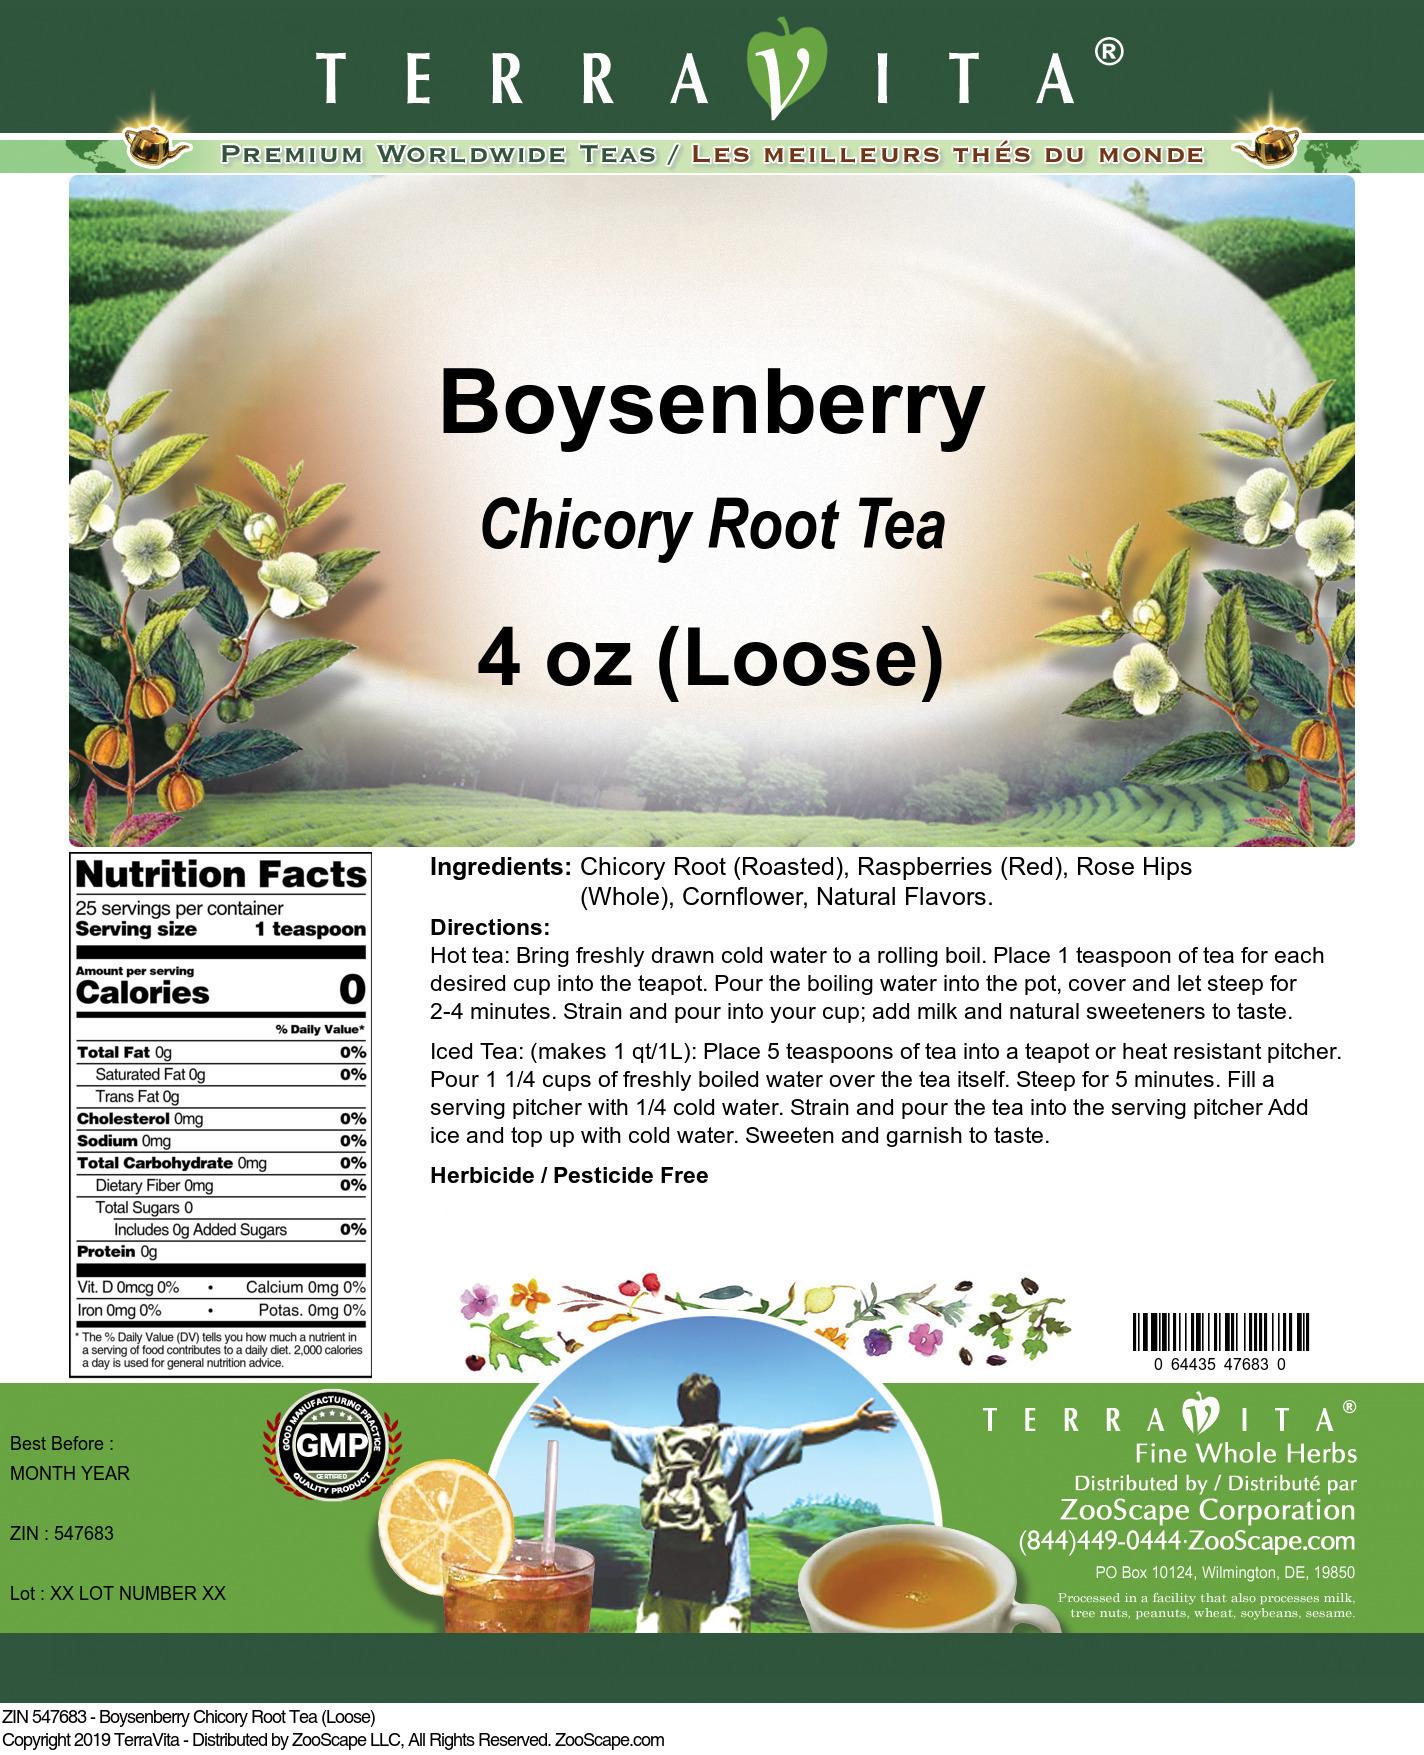 Boysenberry Chicory Root Tea (Loose)